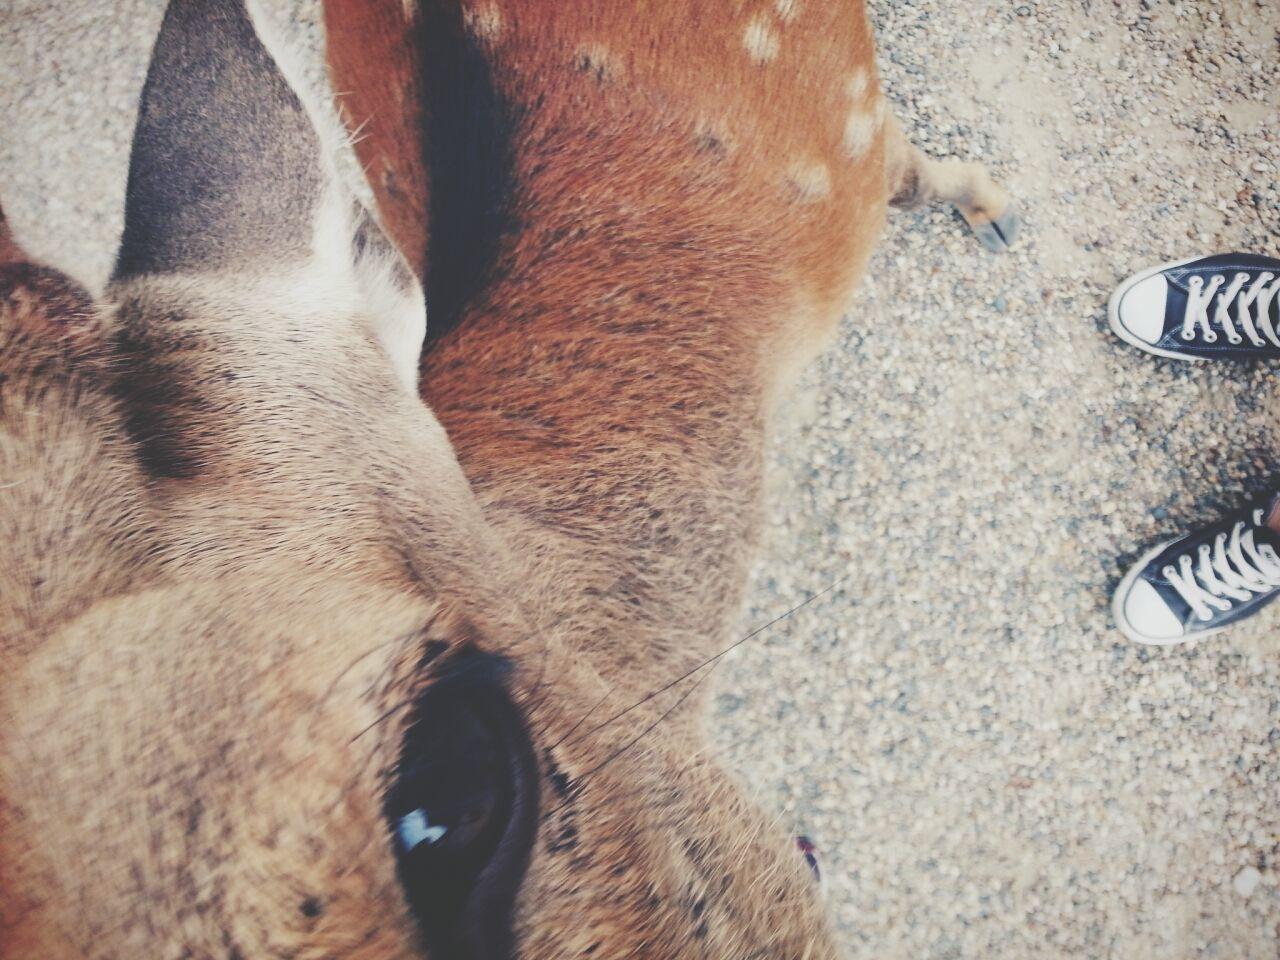 High angle portrait of deer standing on street